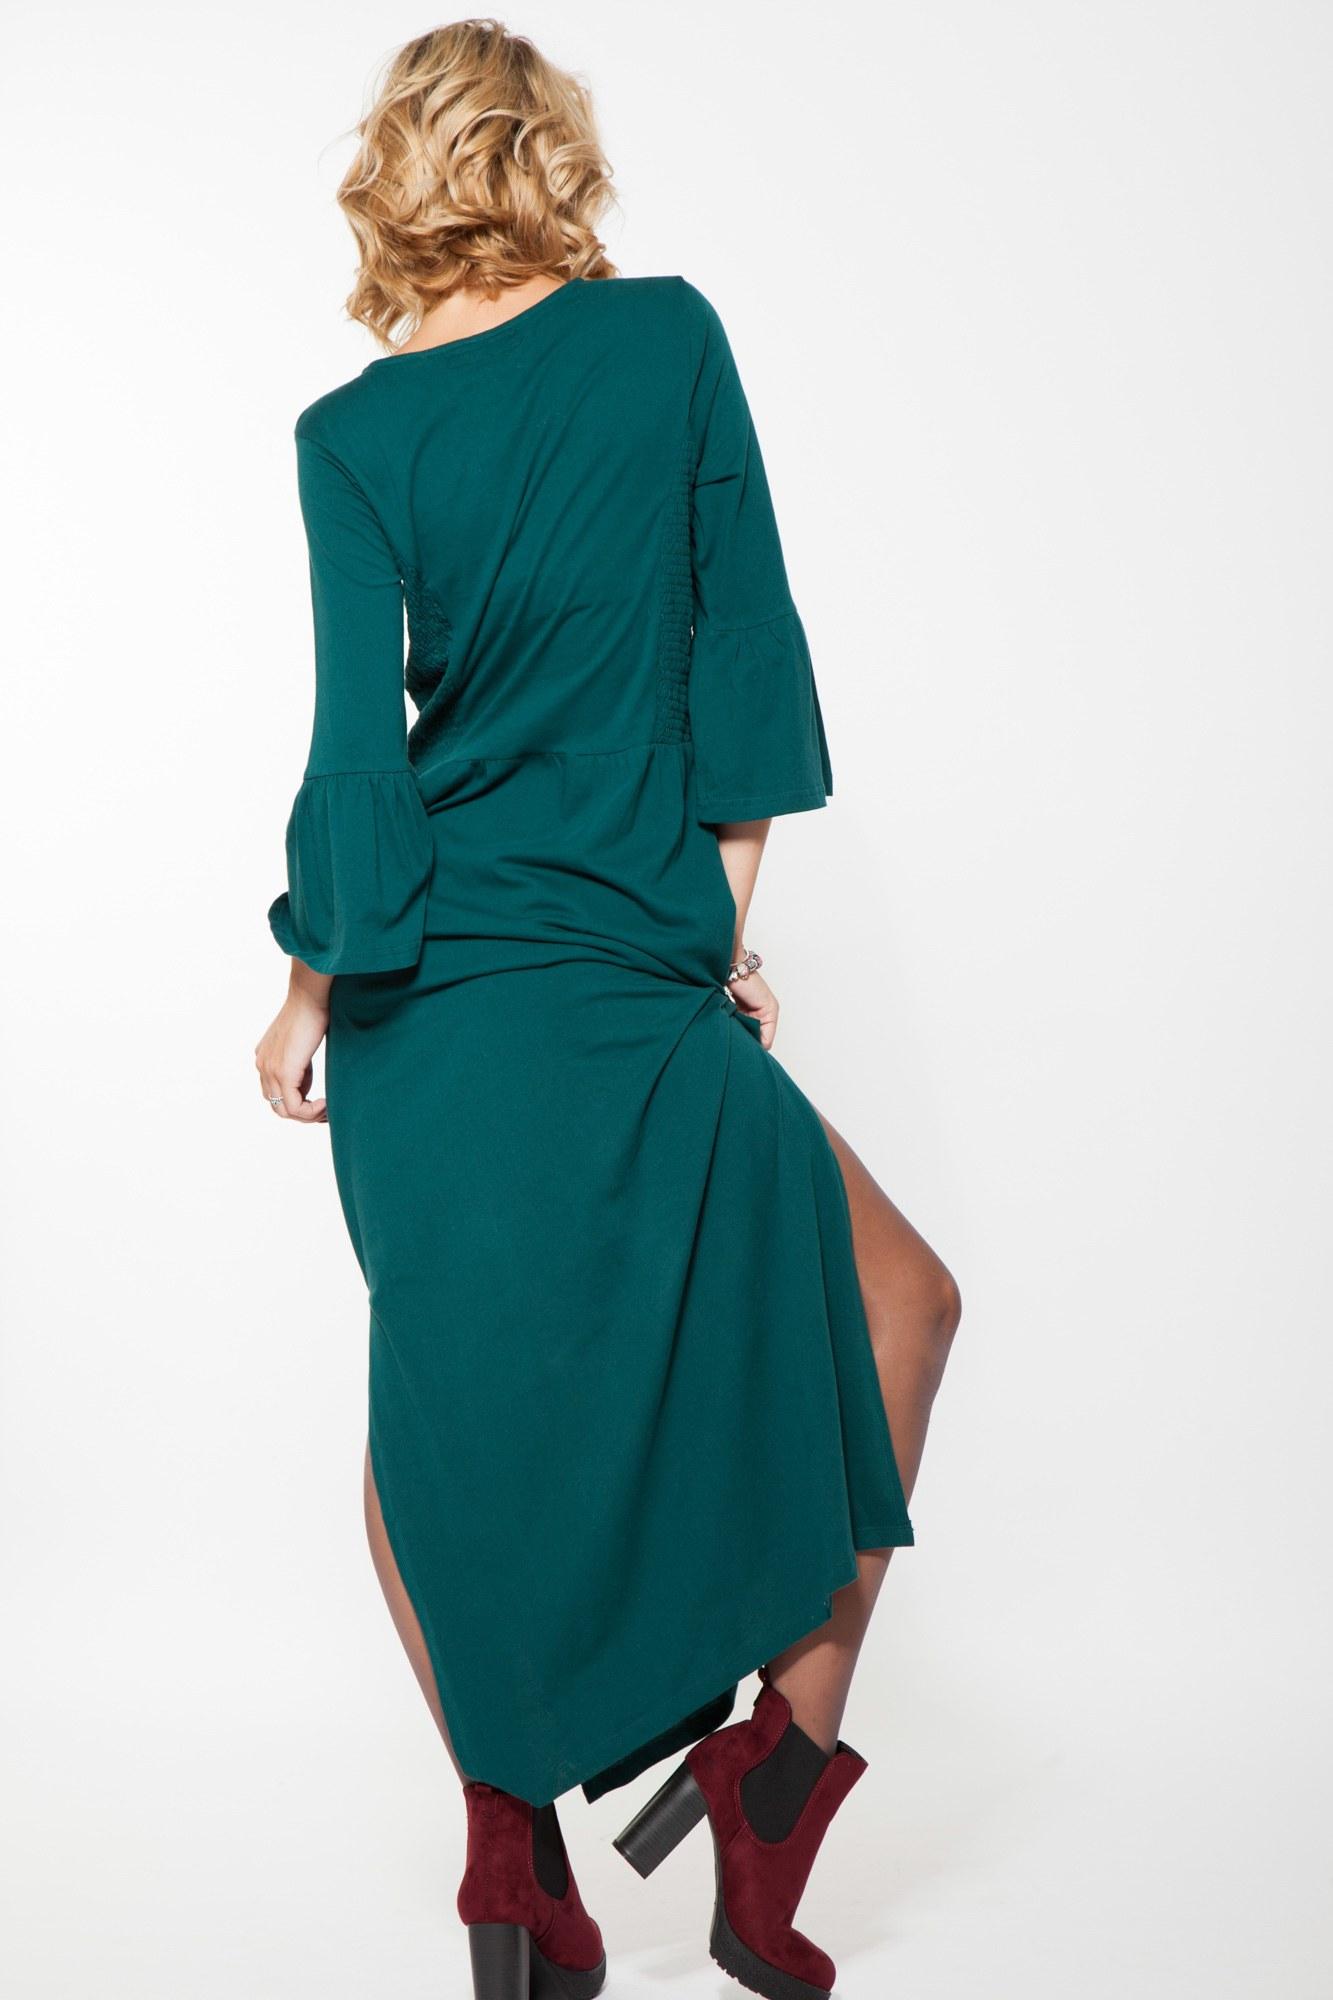 Rochie verde lunga Agata maneci clopot